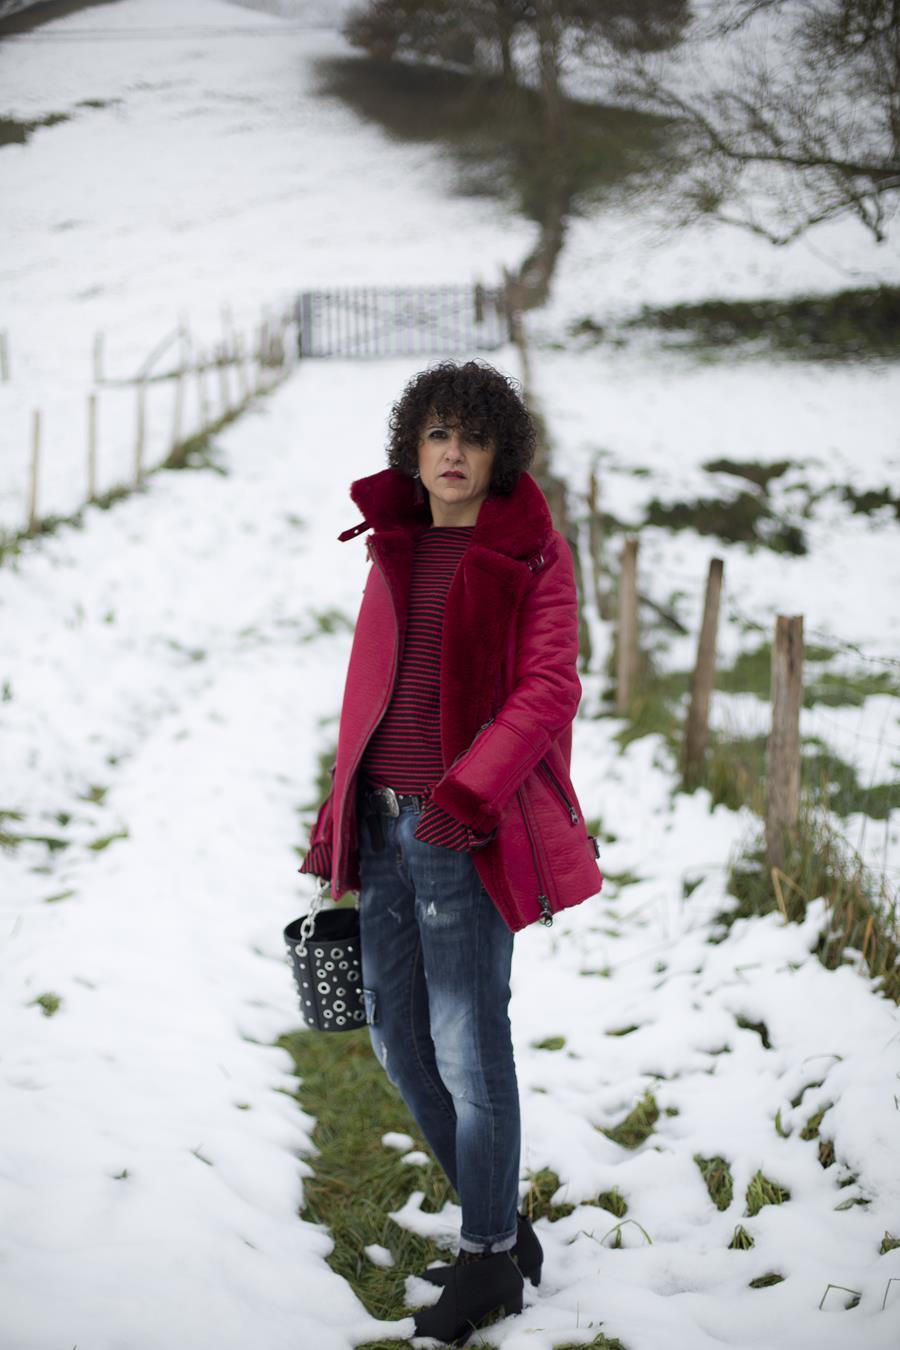 Rebeca Valdivia, personal shopper, estilista, stilist, asesora de imagen, boyfriend jeans, semi bota, botín tacón, heels, bolso tachuelas, tachas, jersey rayas, abrigo doble faz, abrigo rojo, red coat, winter, curls, snow, nieve, maxi earring